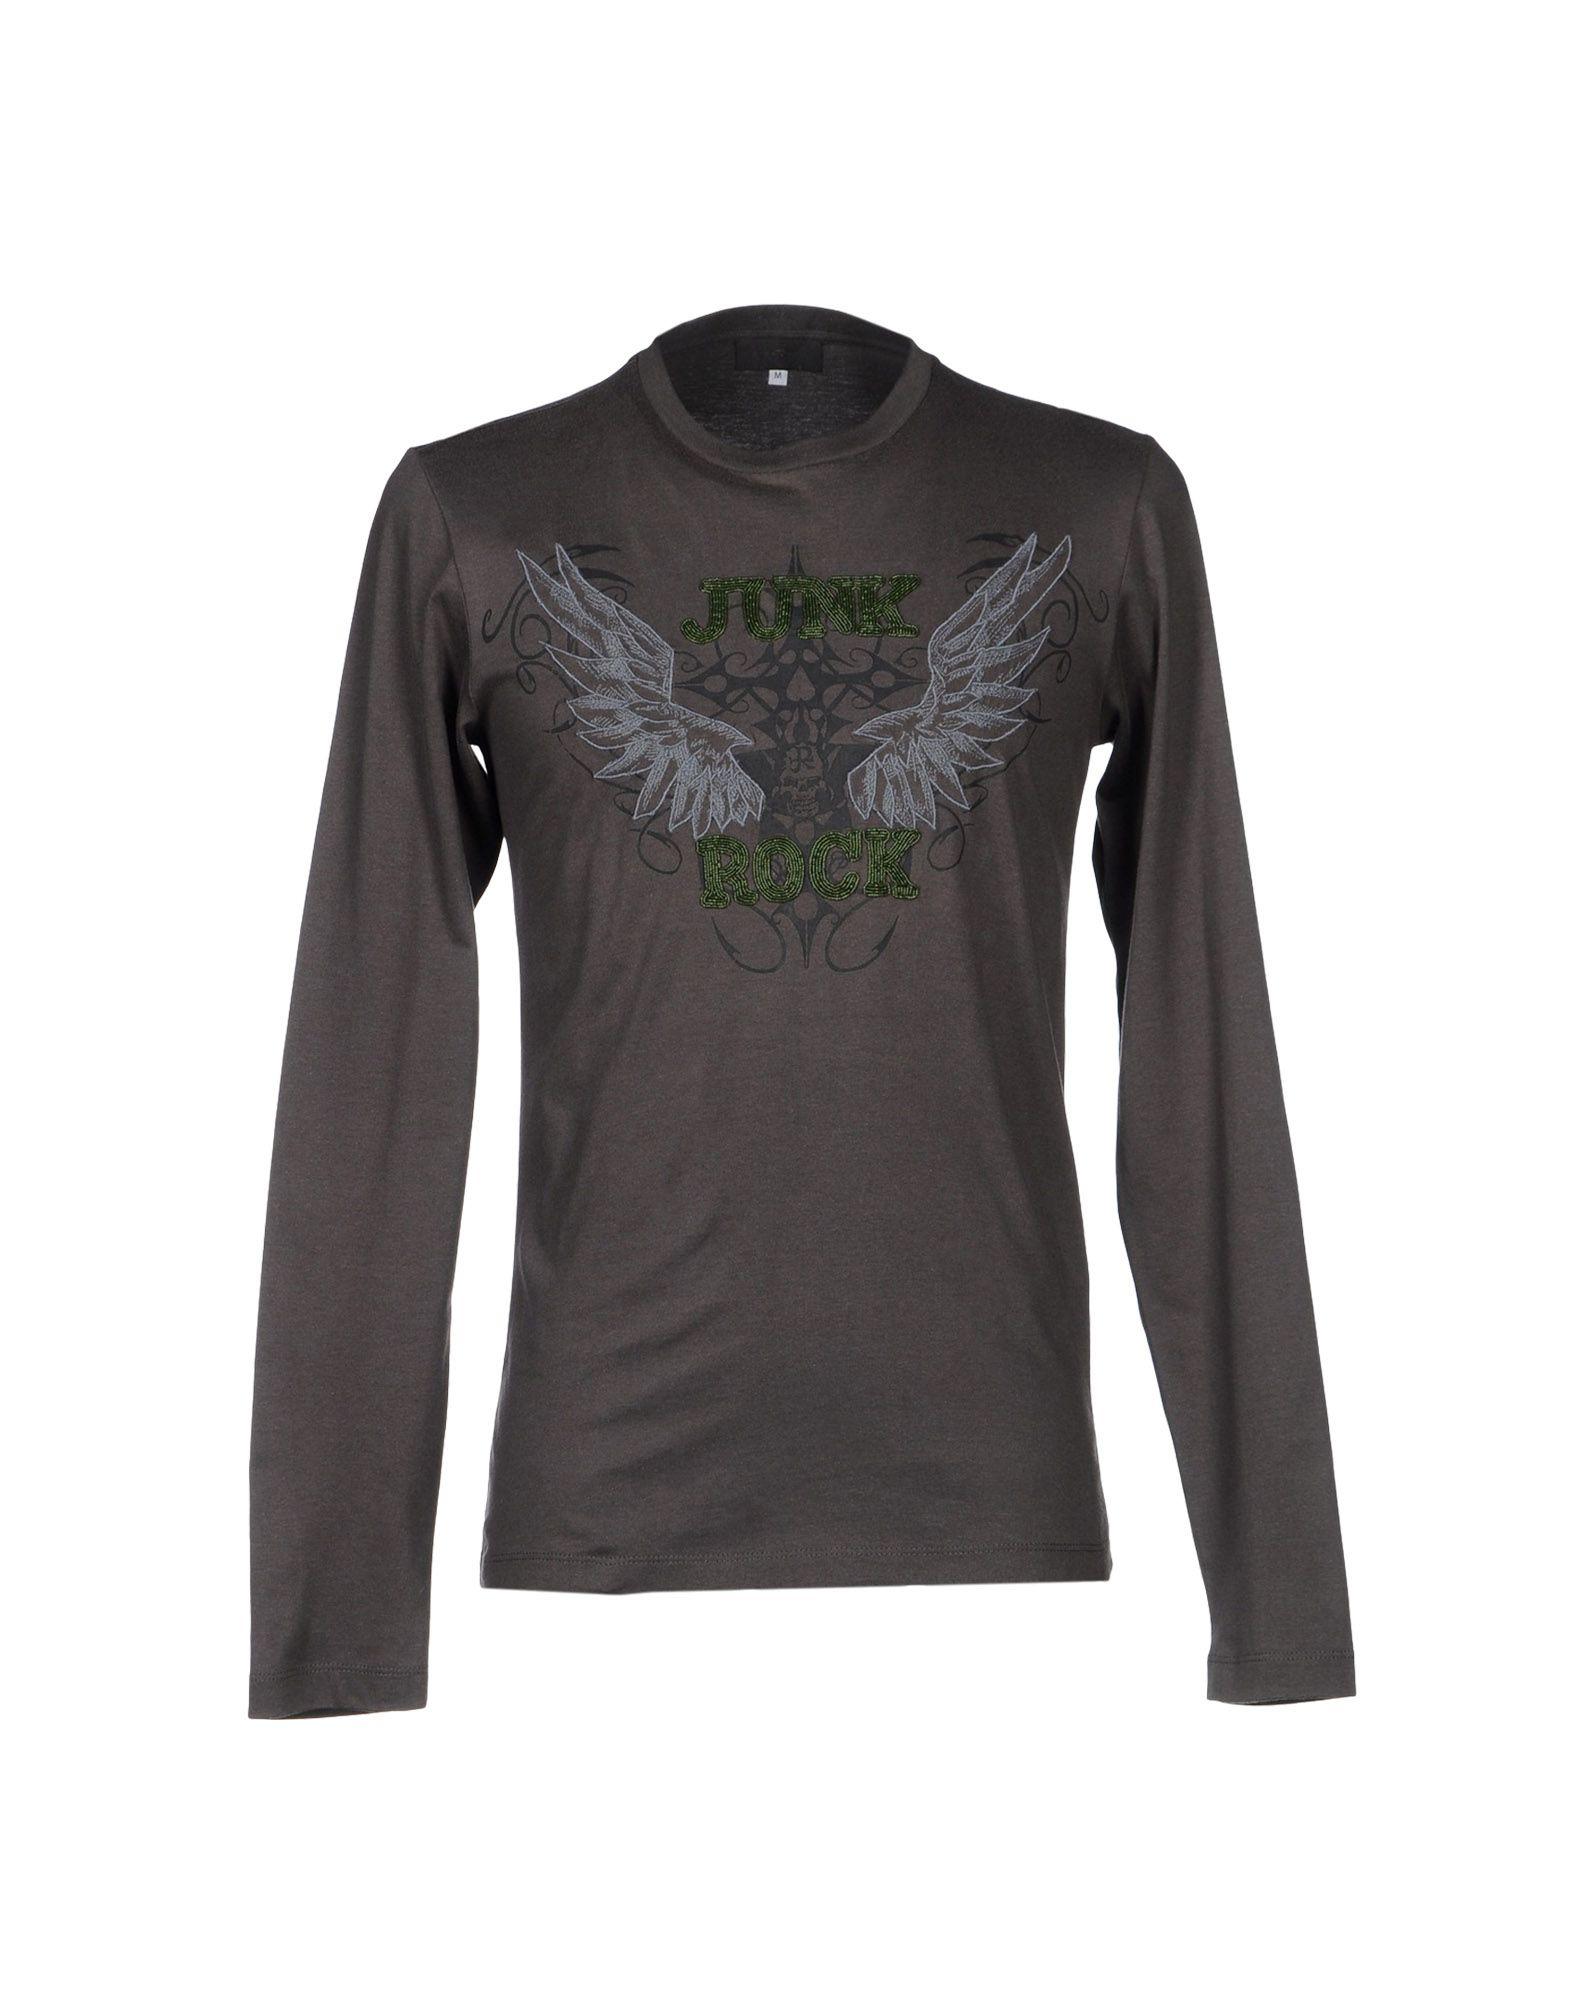 John richmond t shirt in gray for men lyst for T shirt printing richmond va